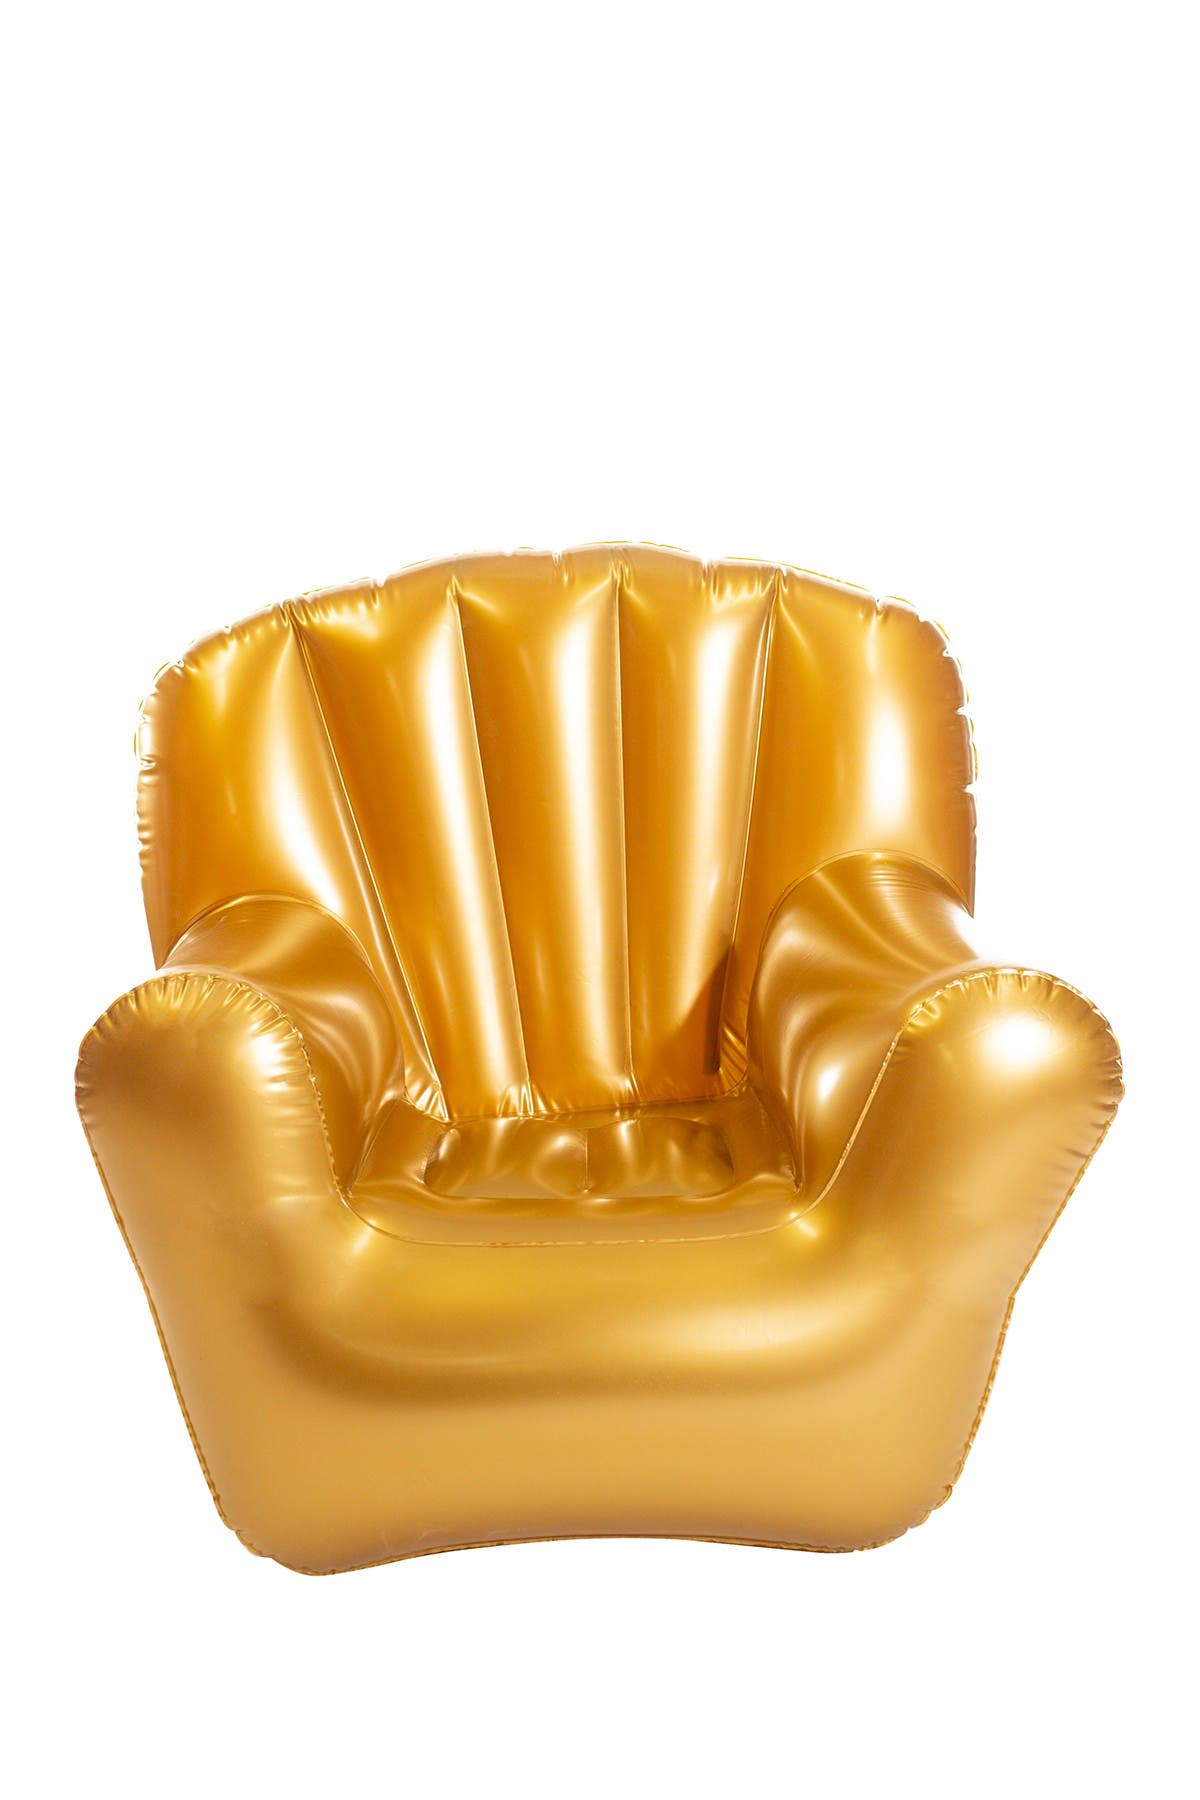 Image of POOLCANDY AirCandy Inflatable Jumbo Size Classic Arm Chair - Metallic Gold